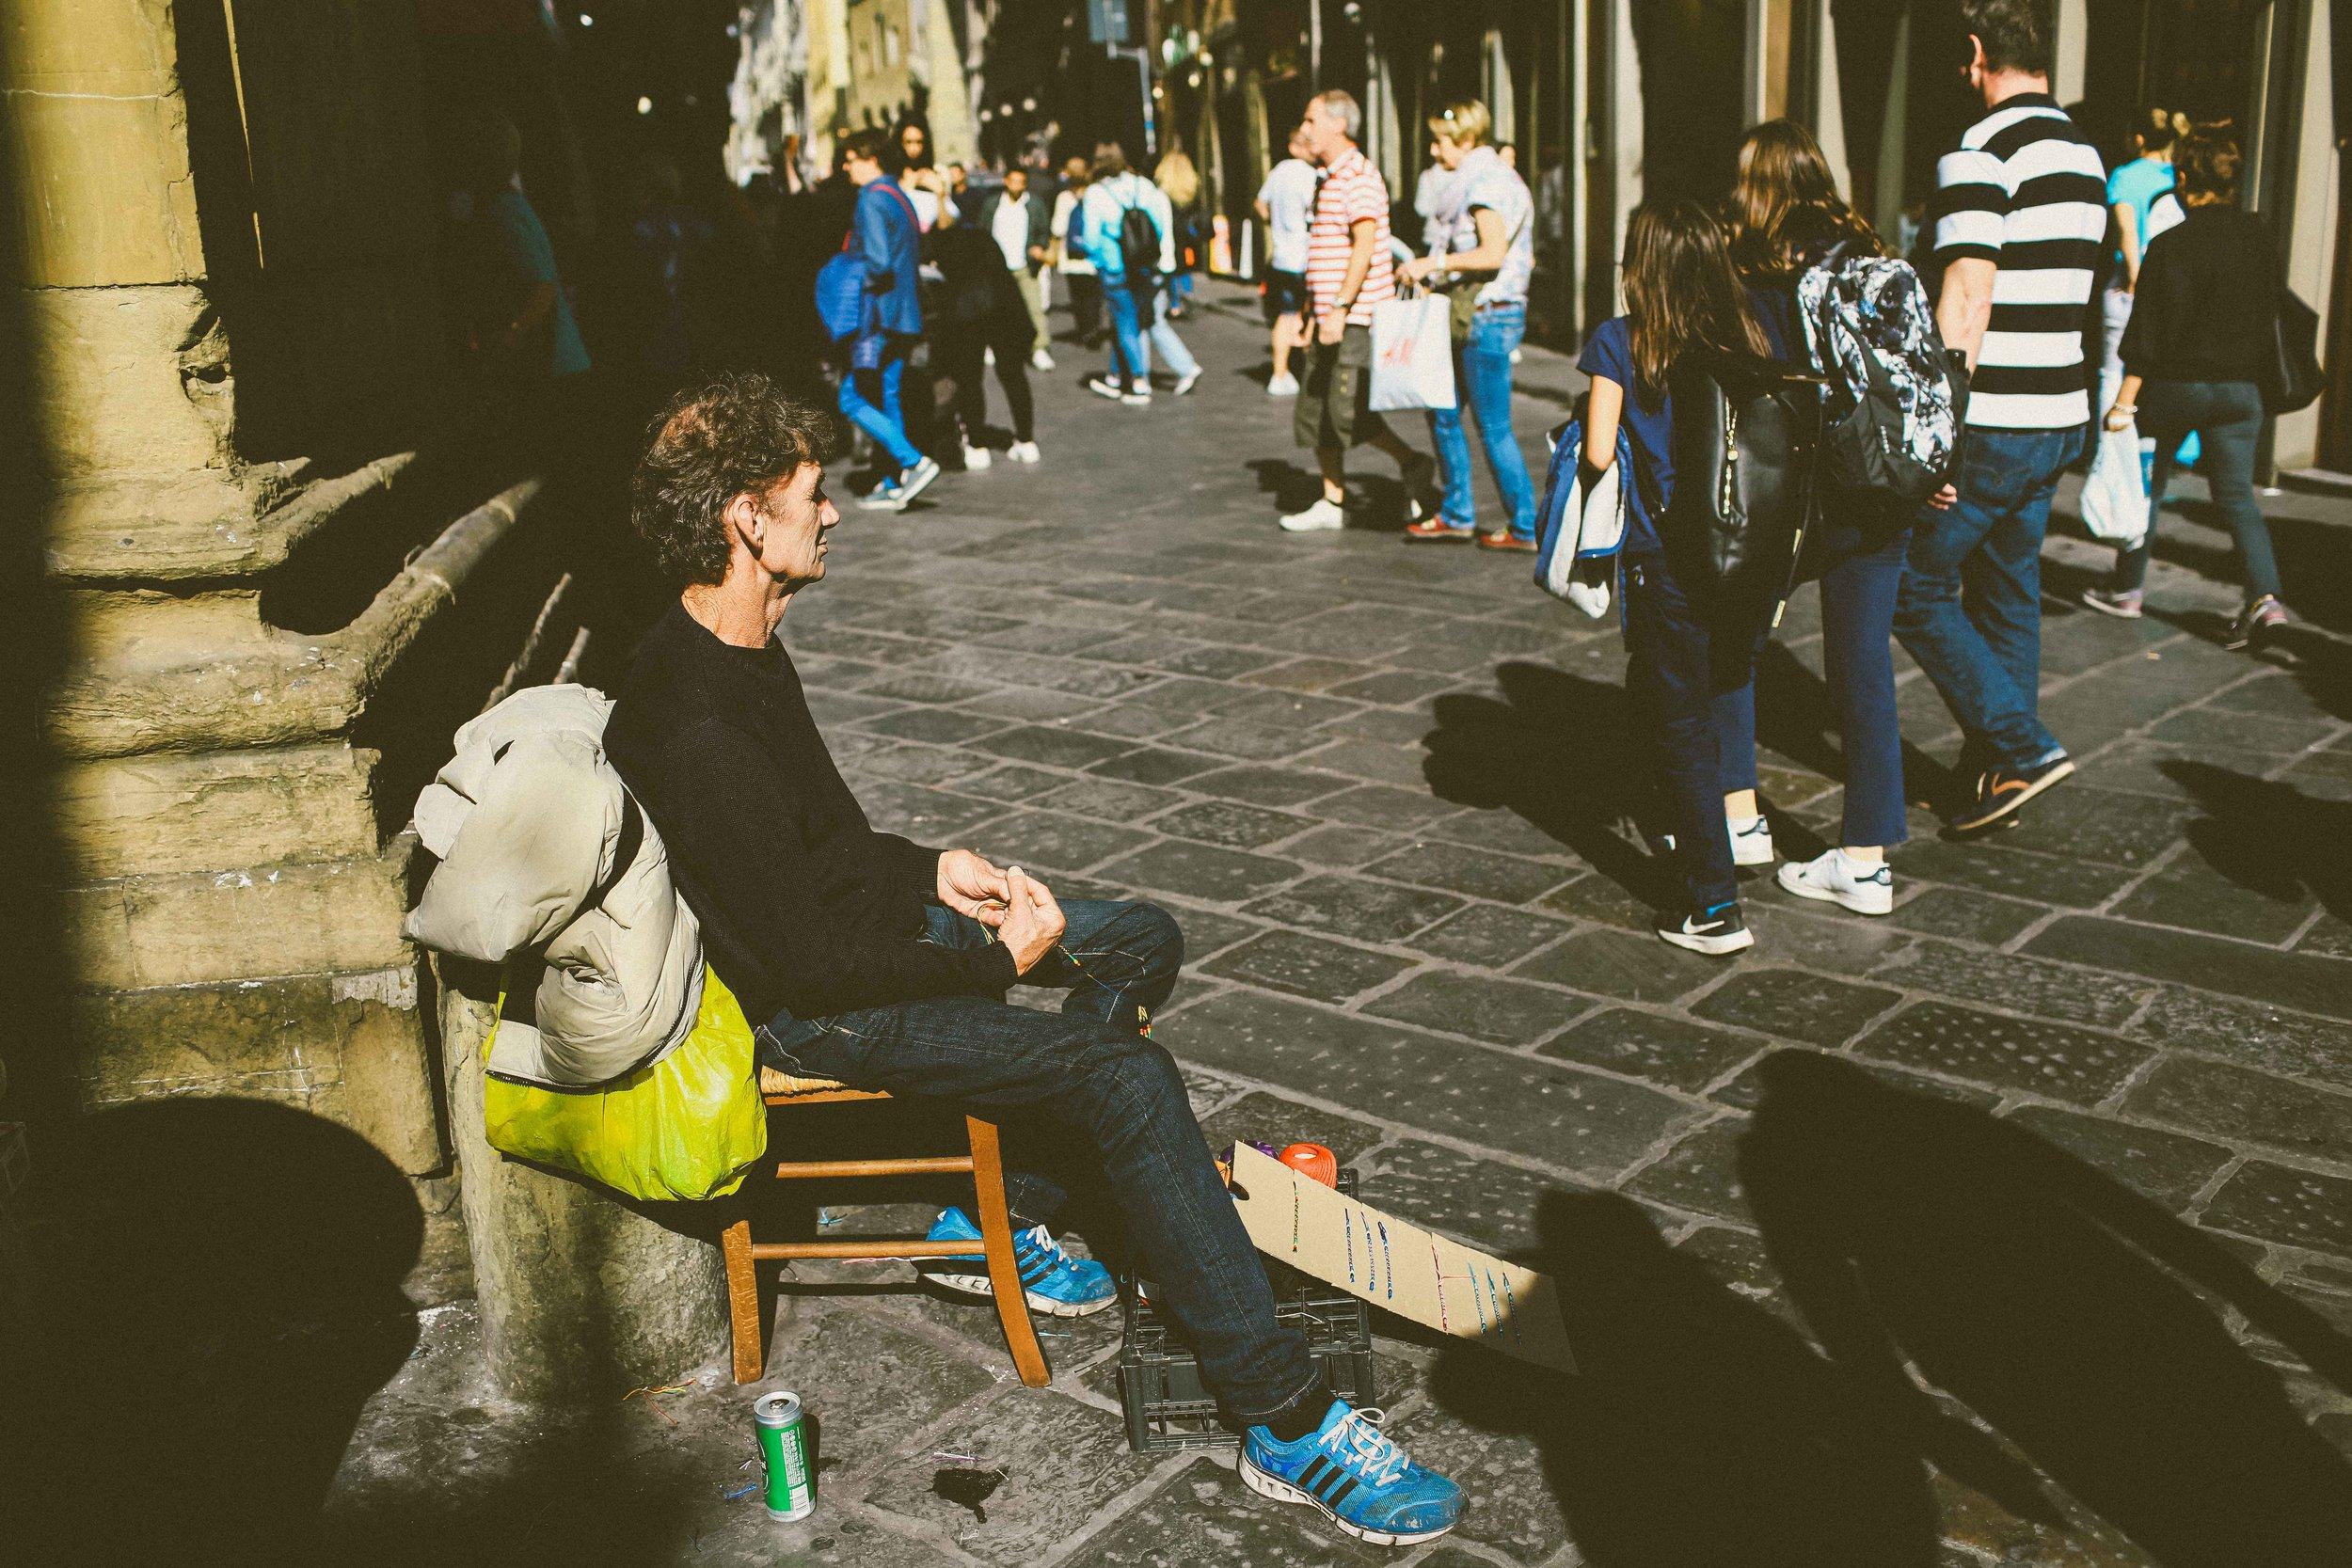 Street_Photographer_Florence_Italy_5.jpg